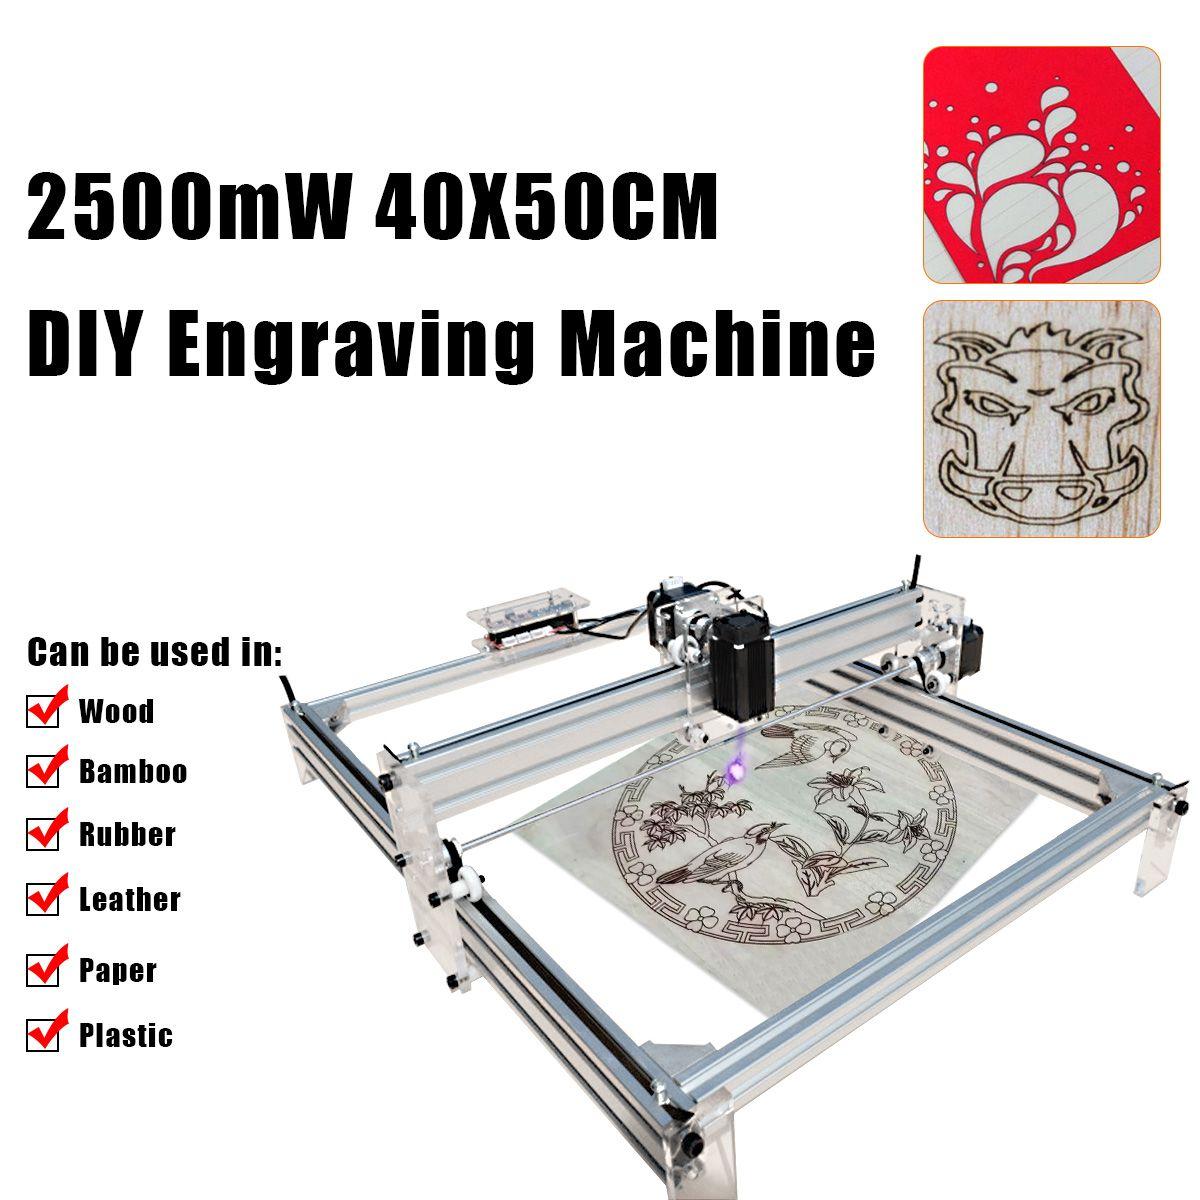 New 40X50CM DC 12V 2500mW DIY Desktop Mini Laser Cutting/Engraving Machine Printer Carving with Laser Goggles